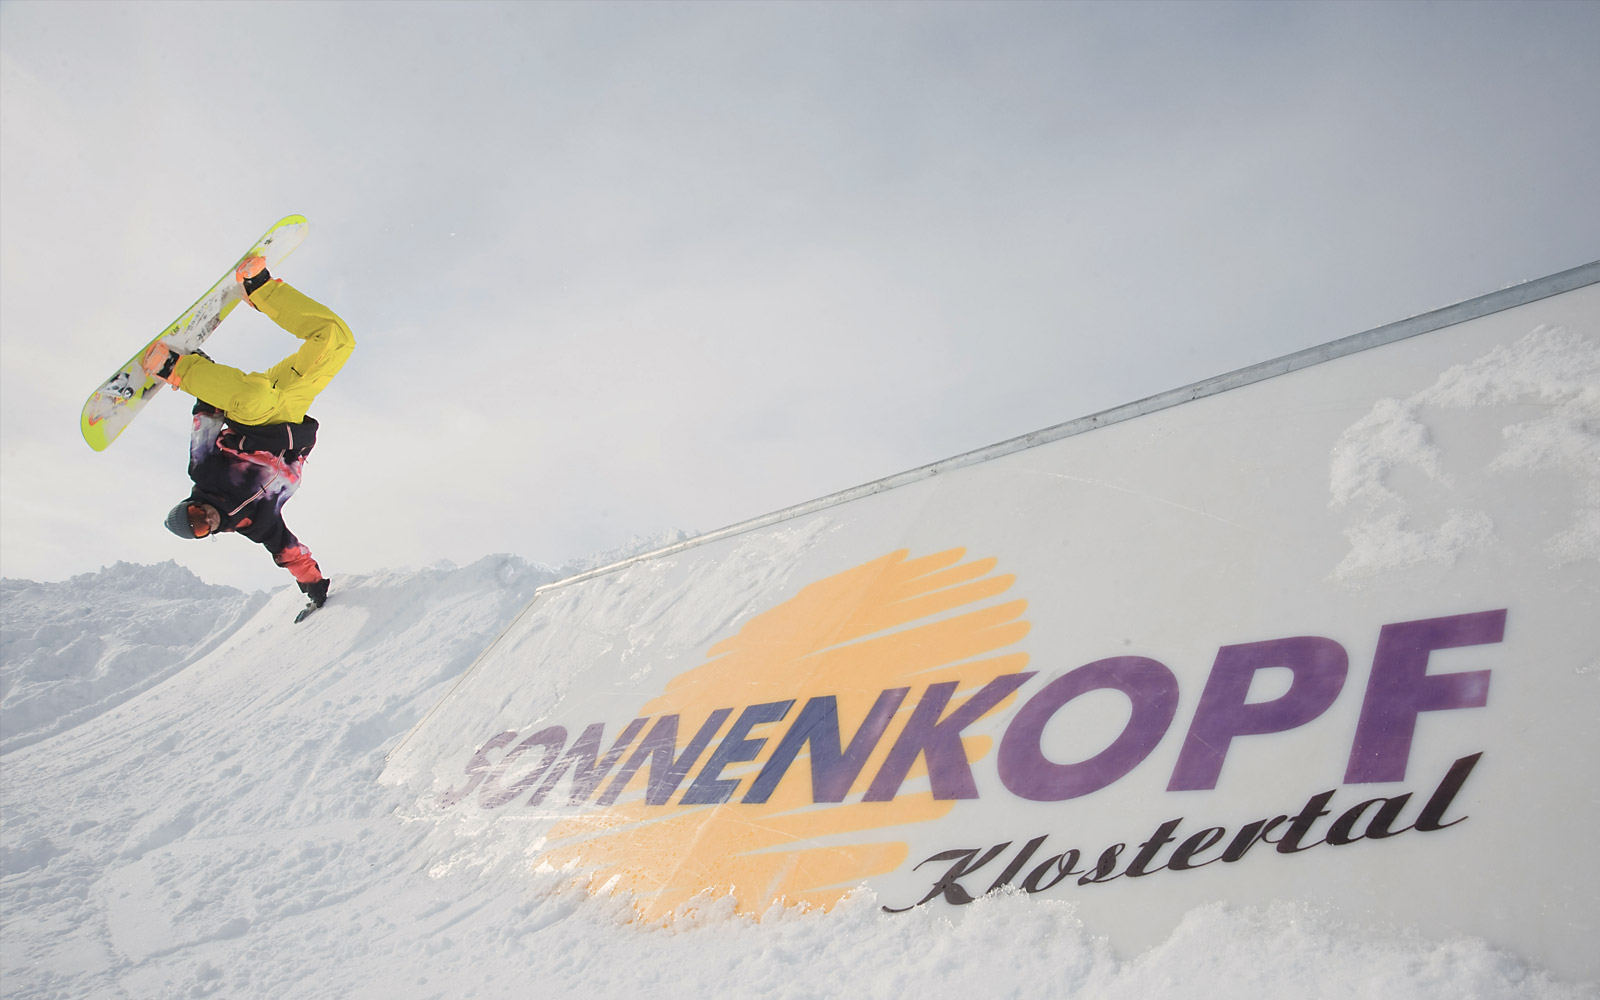 Sonnenkopf Skigebiet